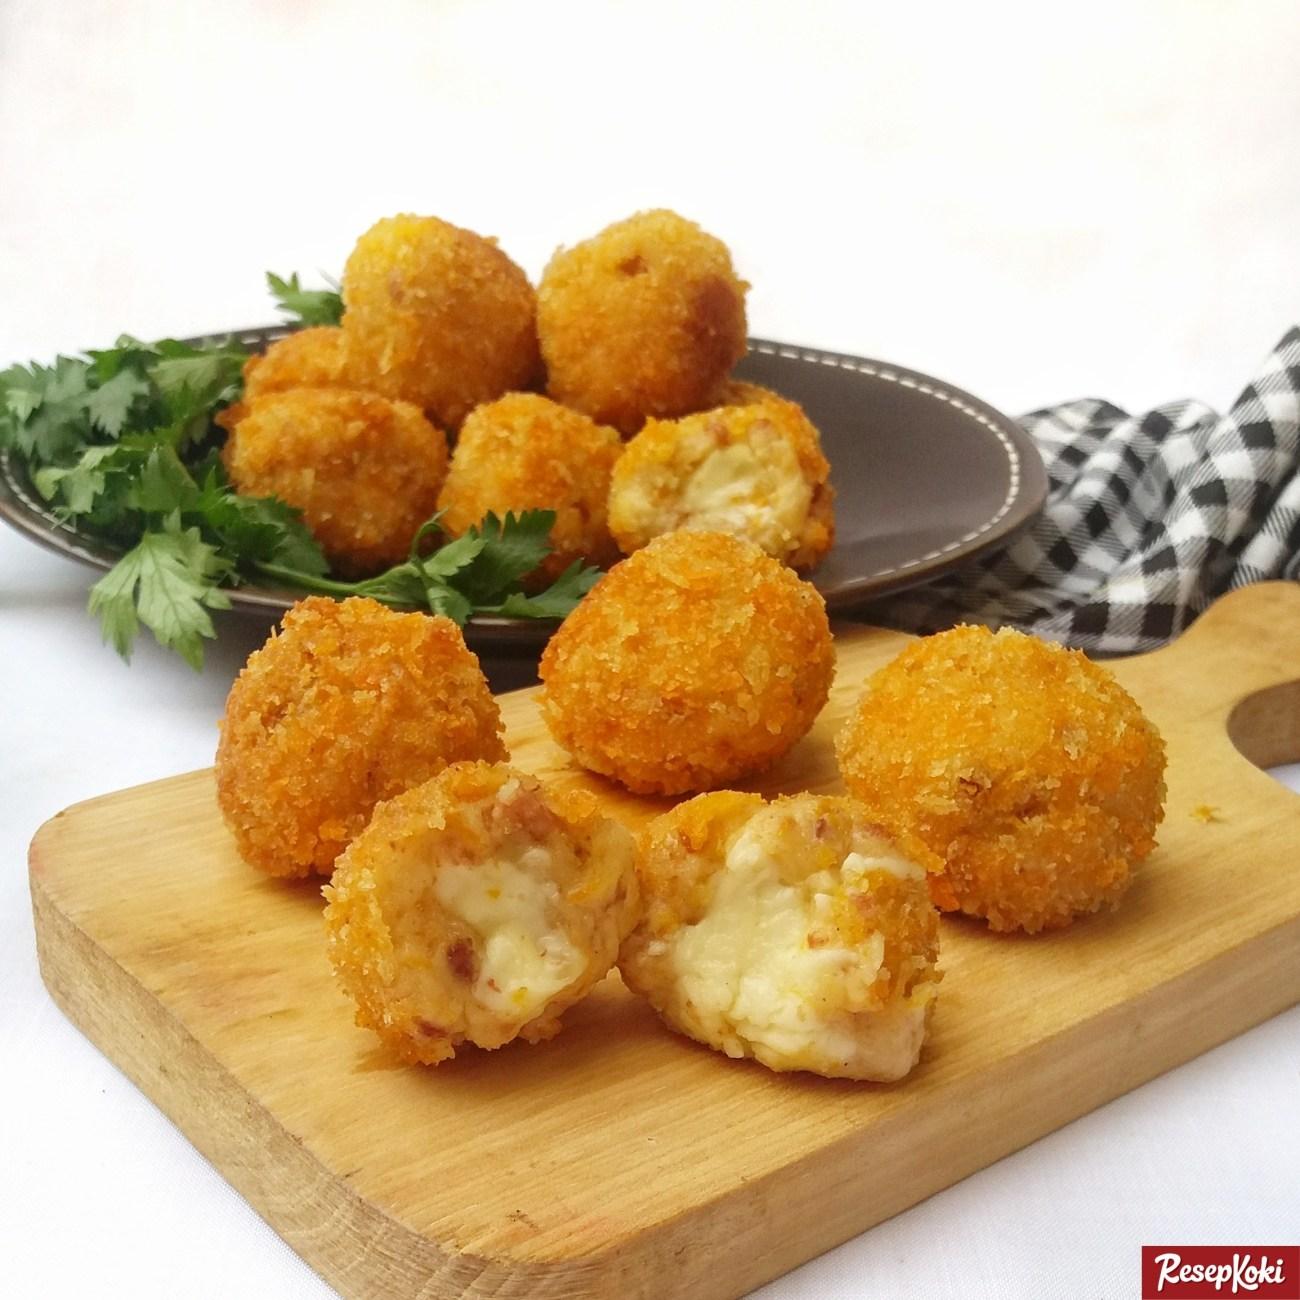 Agen frozen food Sawangan Depok